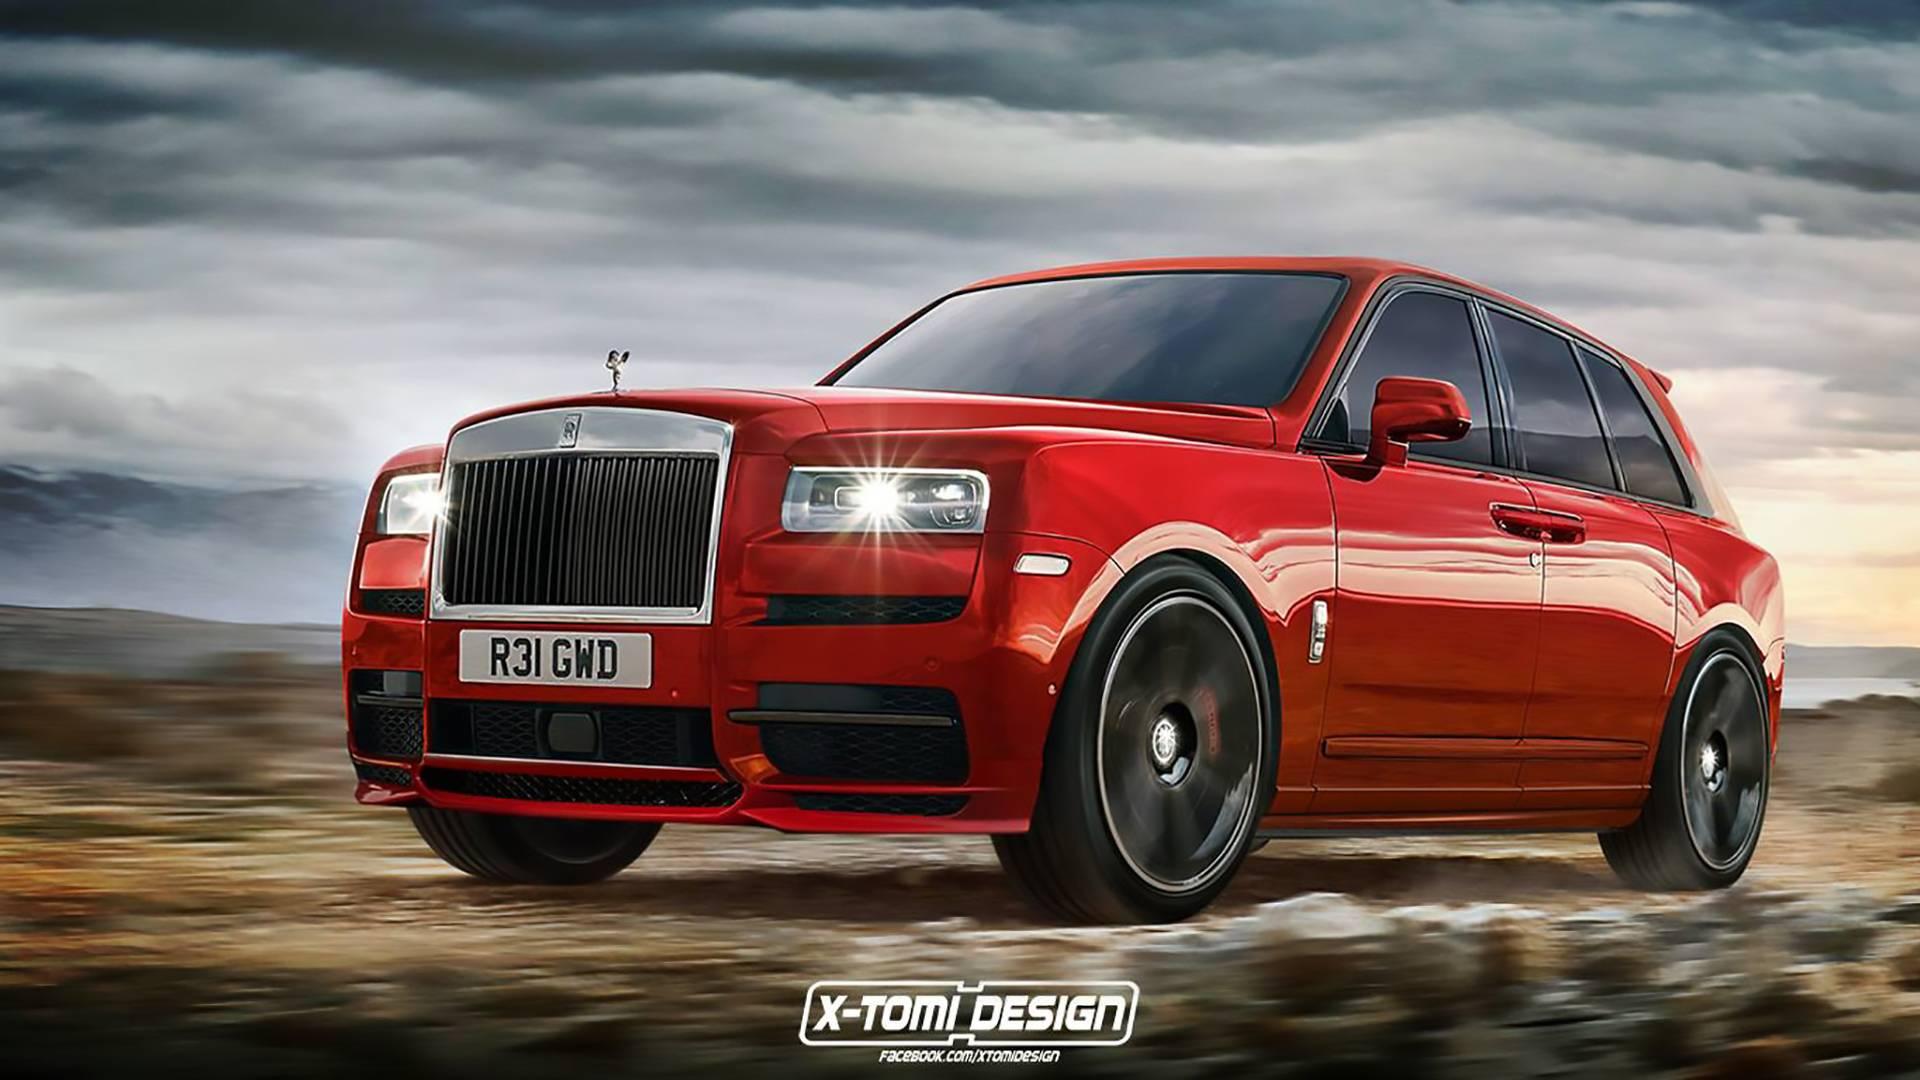 2018 Rolls Royce Cullinan Suv Page 2 Conti Talk